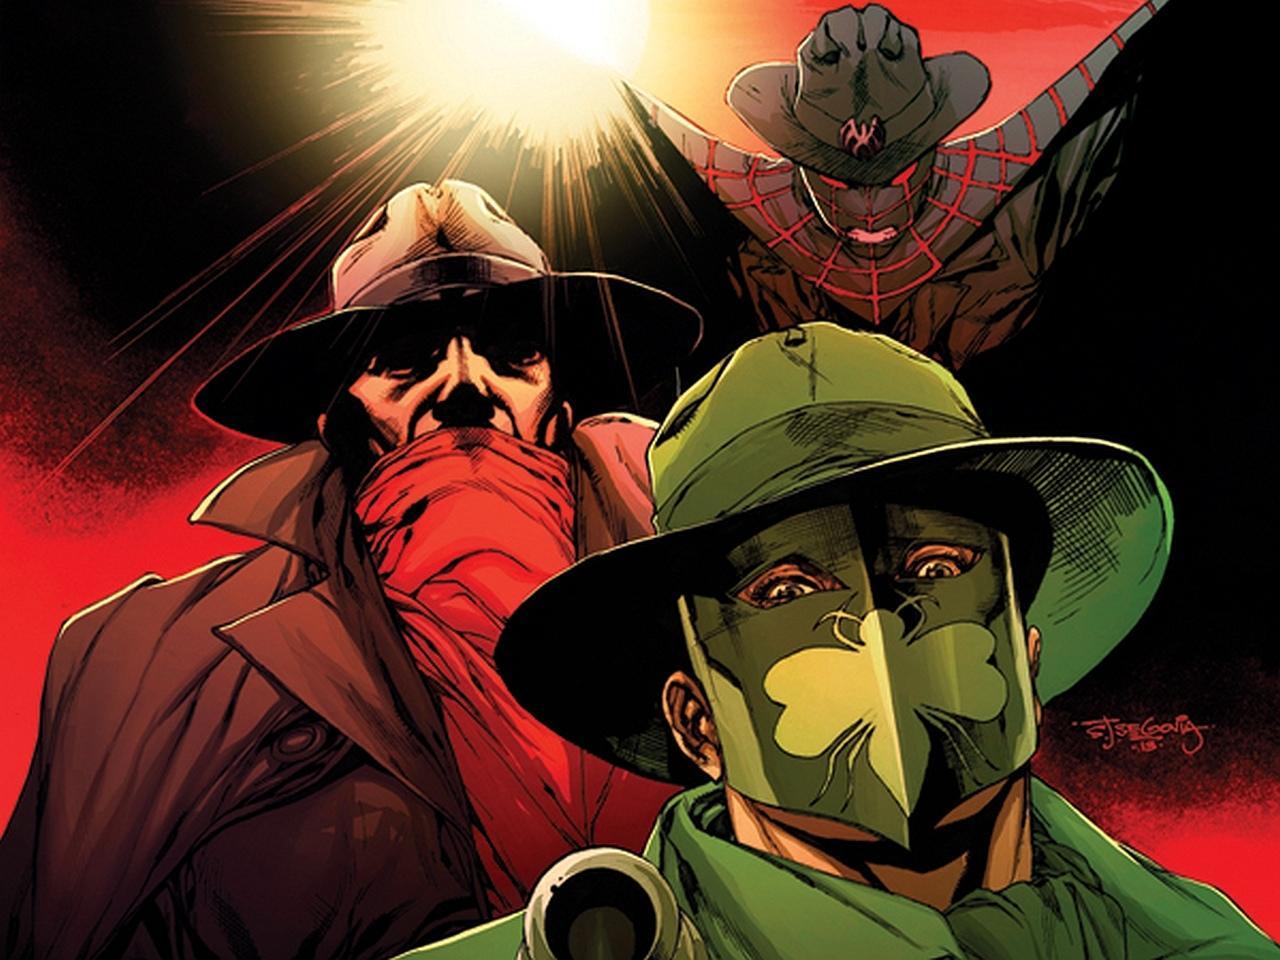 Masks Comics wallpapers HD quality